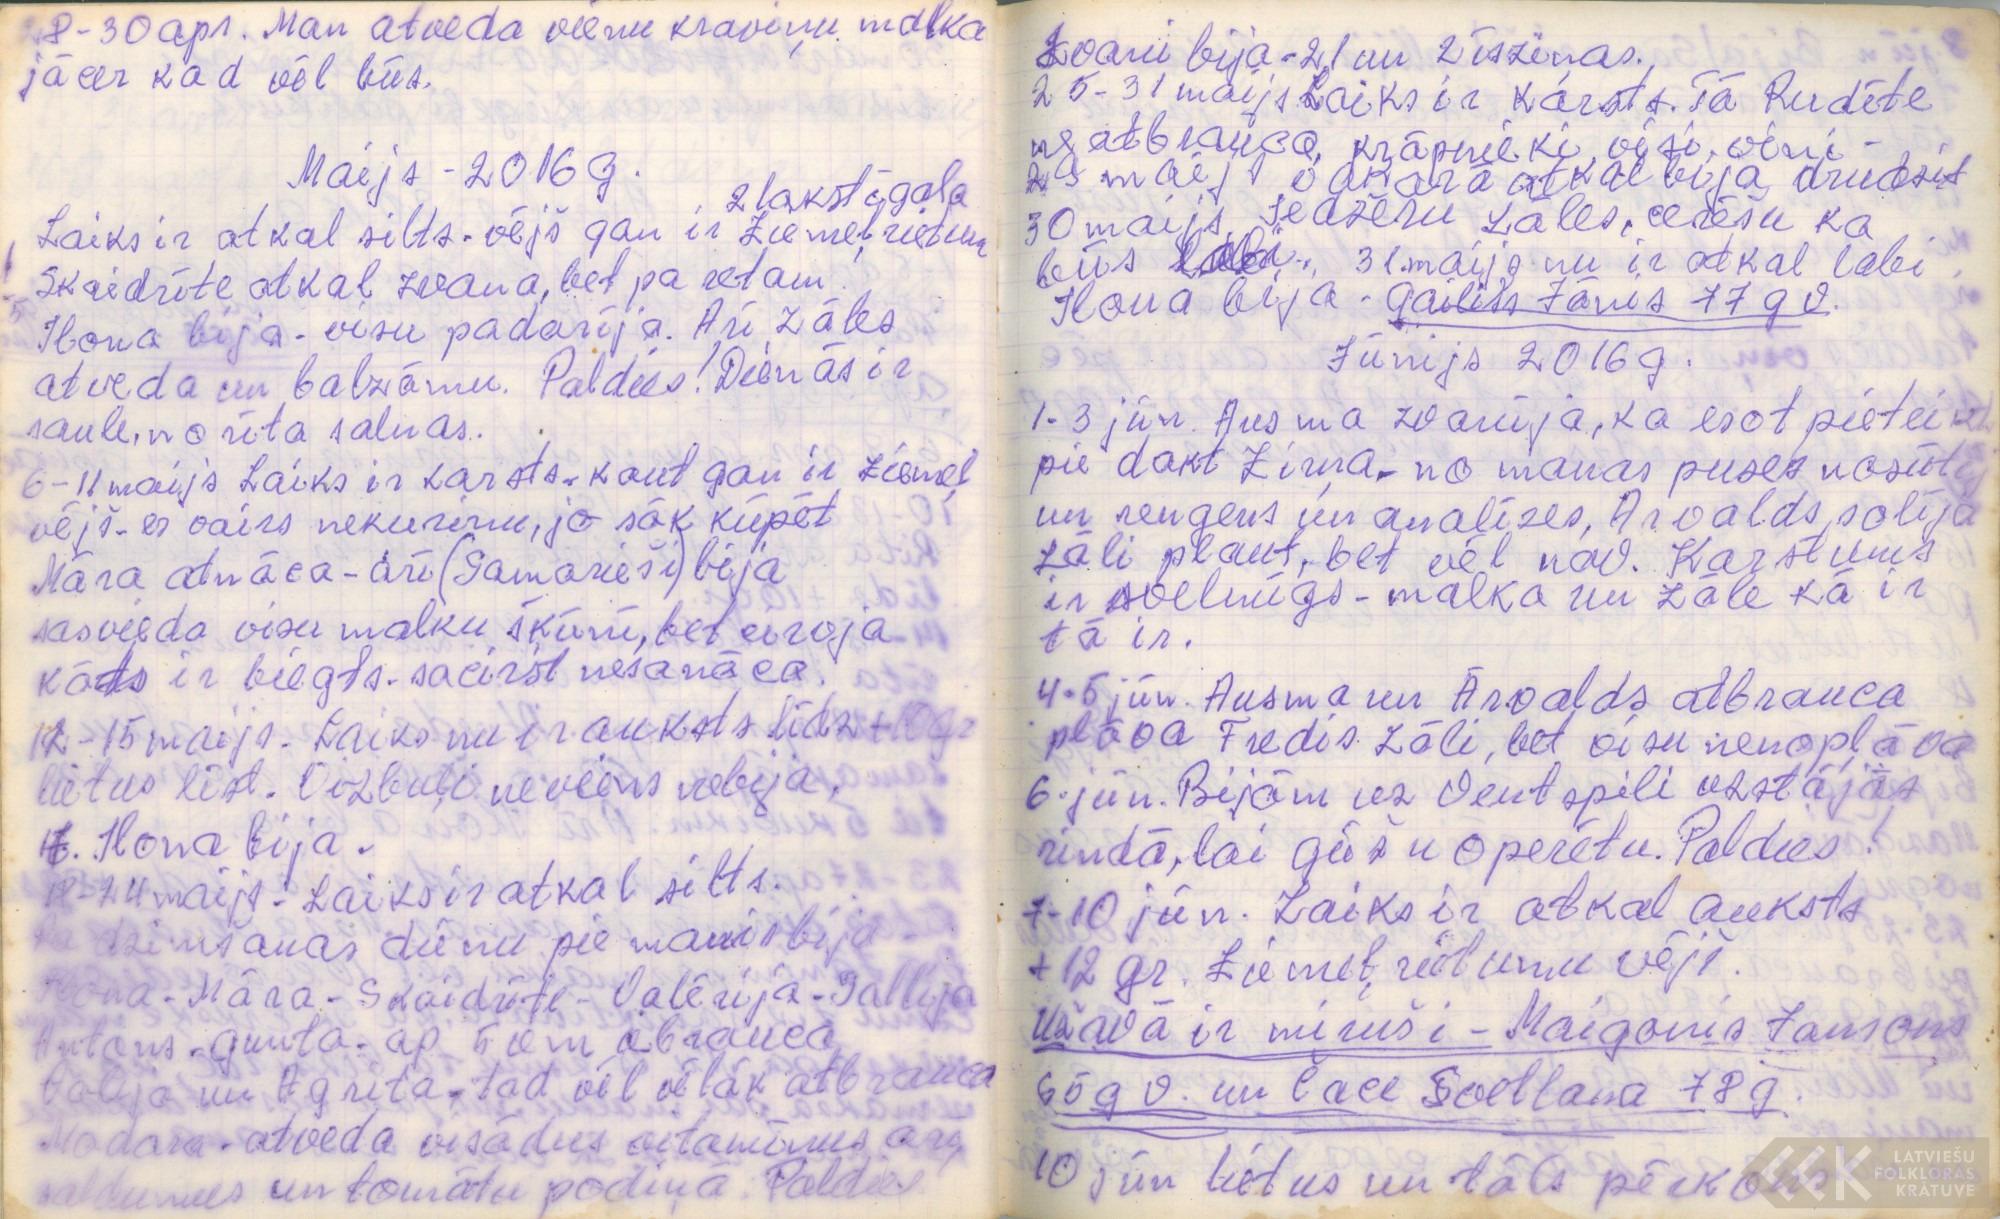 Ak139-Zigridas-Paegles-dienasgramatas-06-0100